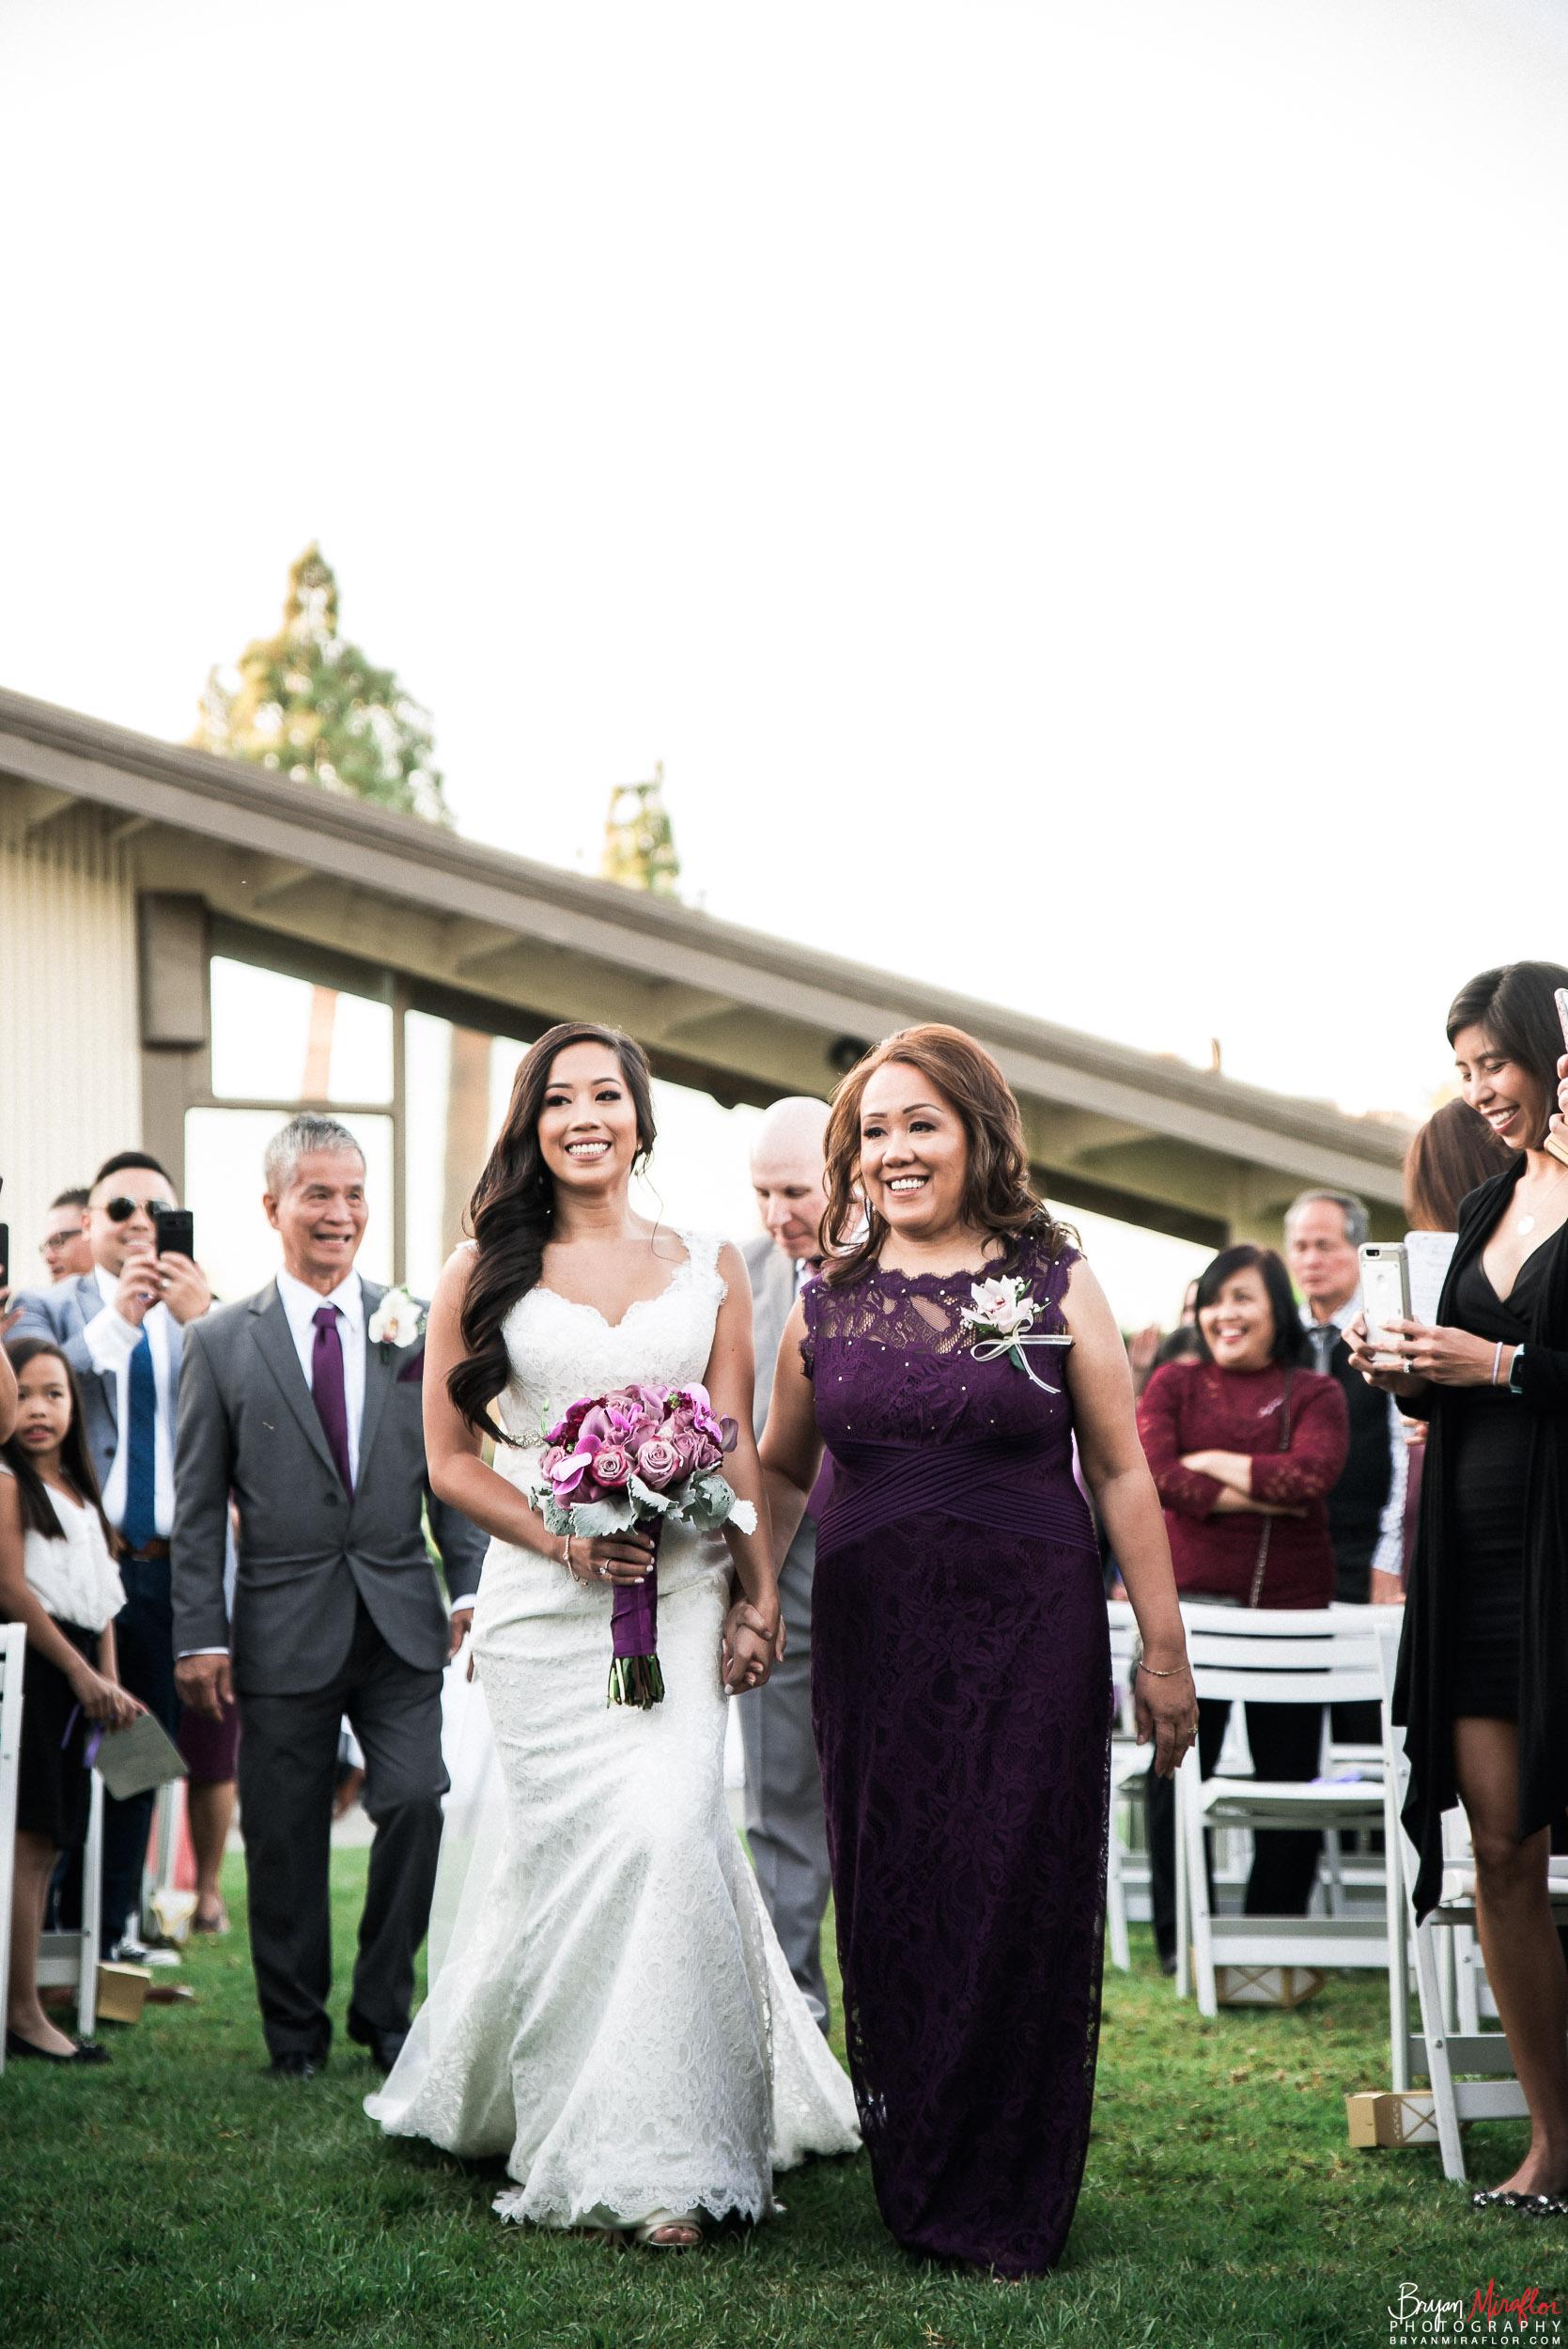 Bryan-Miraflor-Photography-Trisha-Dexter-Married-20170923-053.jpg